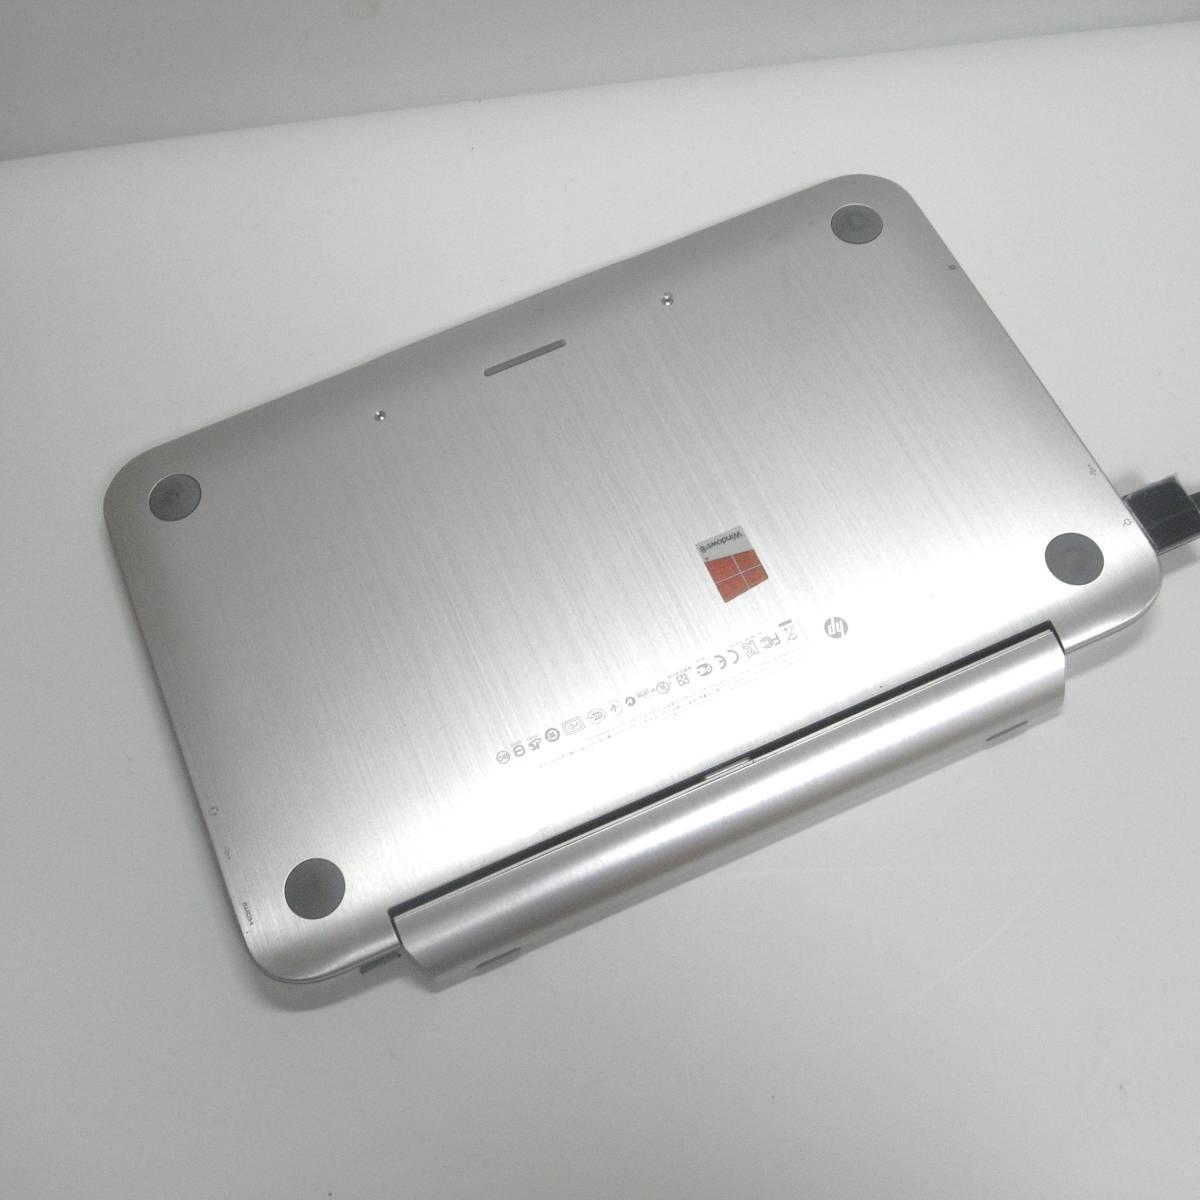 HP Envy TPN-P104 送料無料 タブレットPC+キーボード付き_画像4